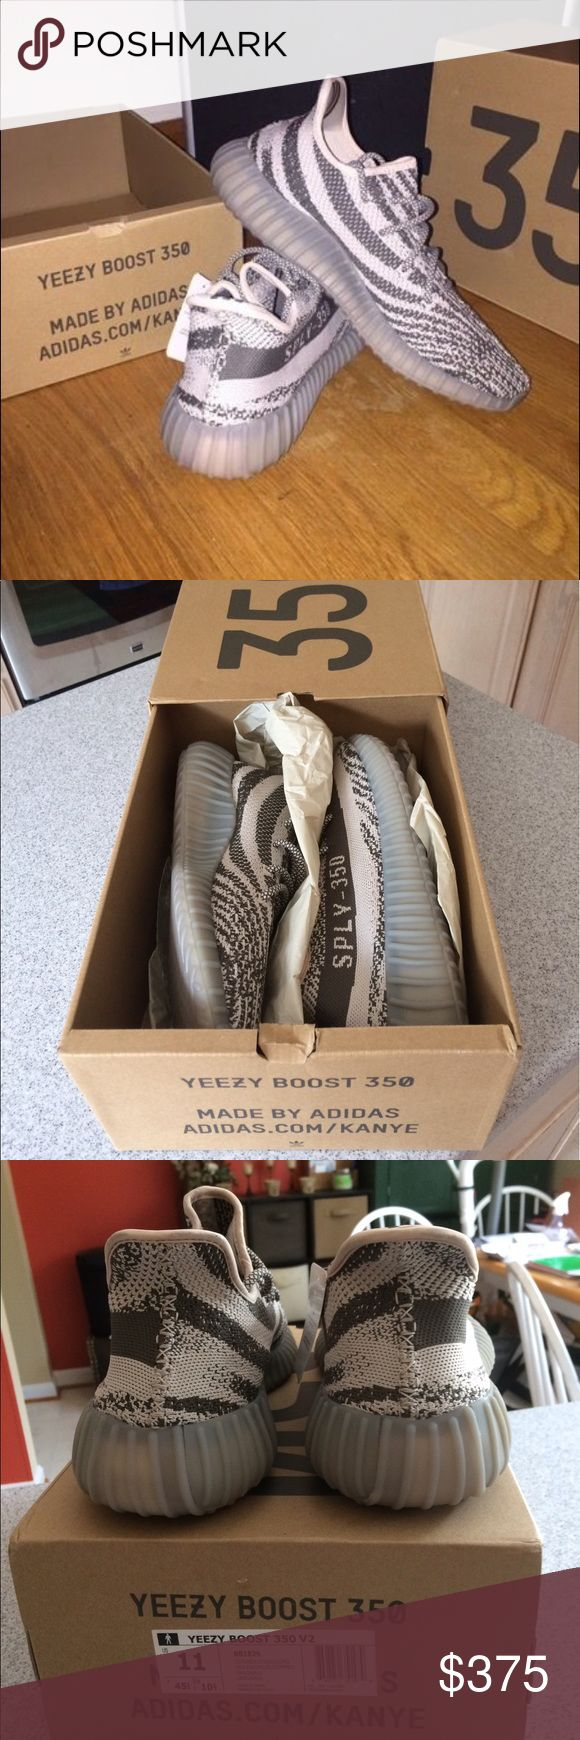 yeezy boost 350 v2 price yeezy boost size 11